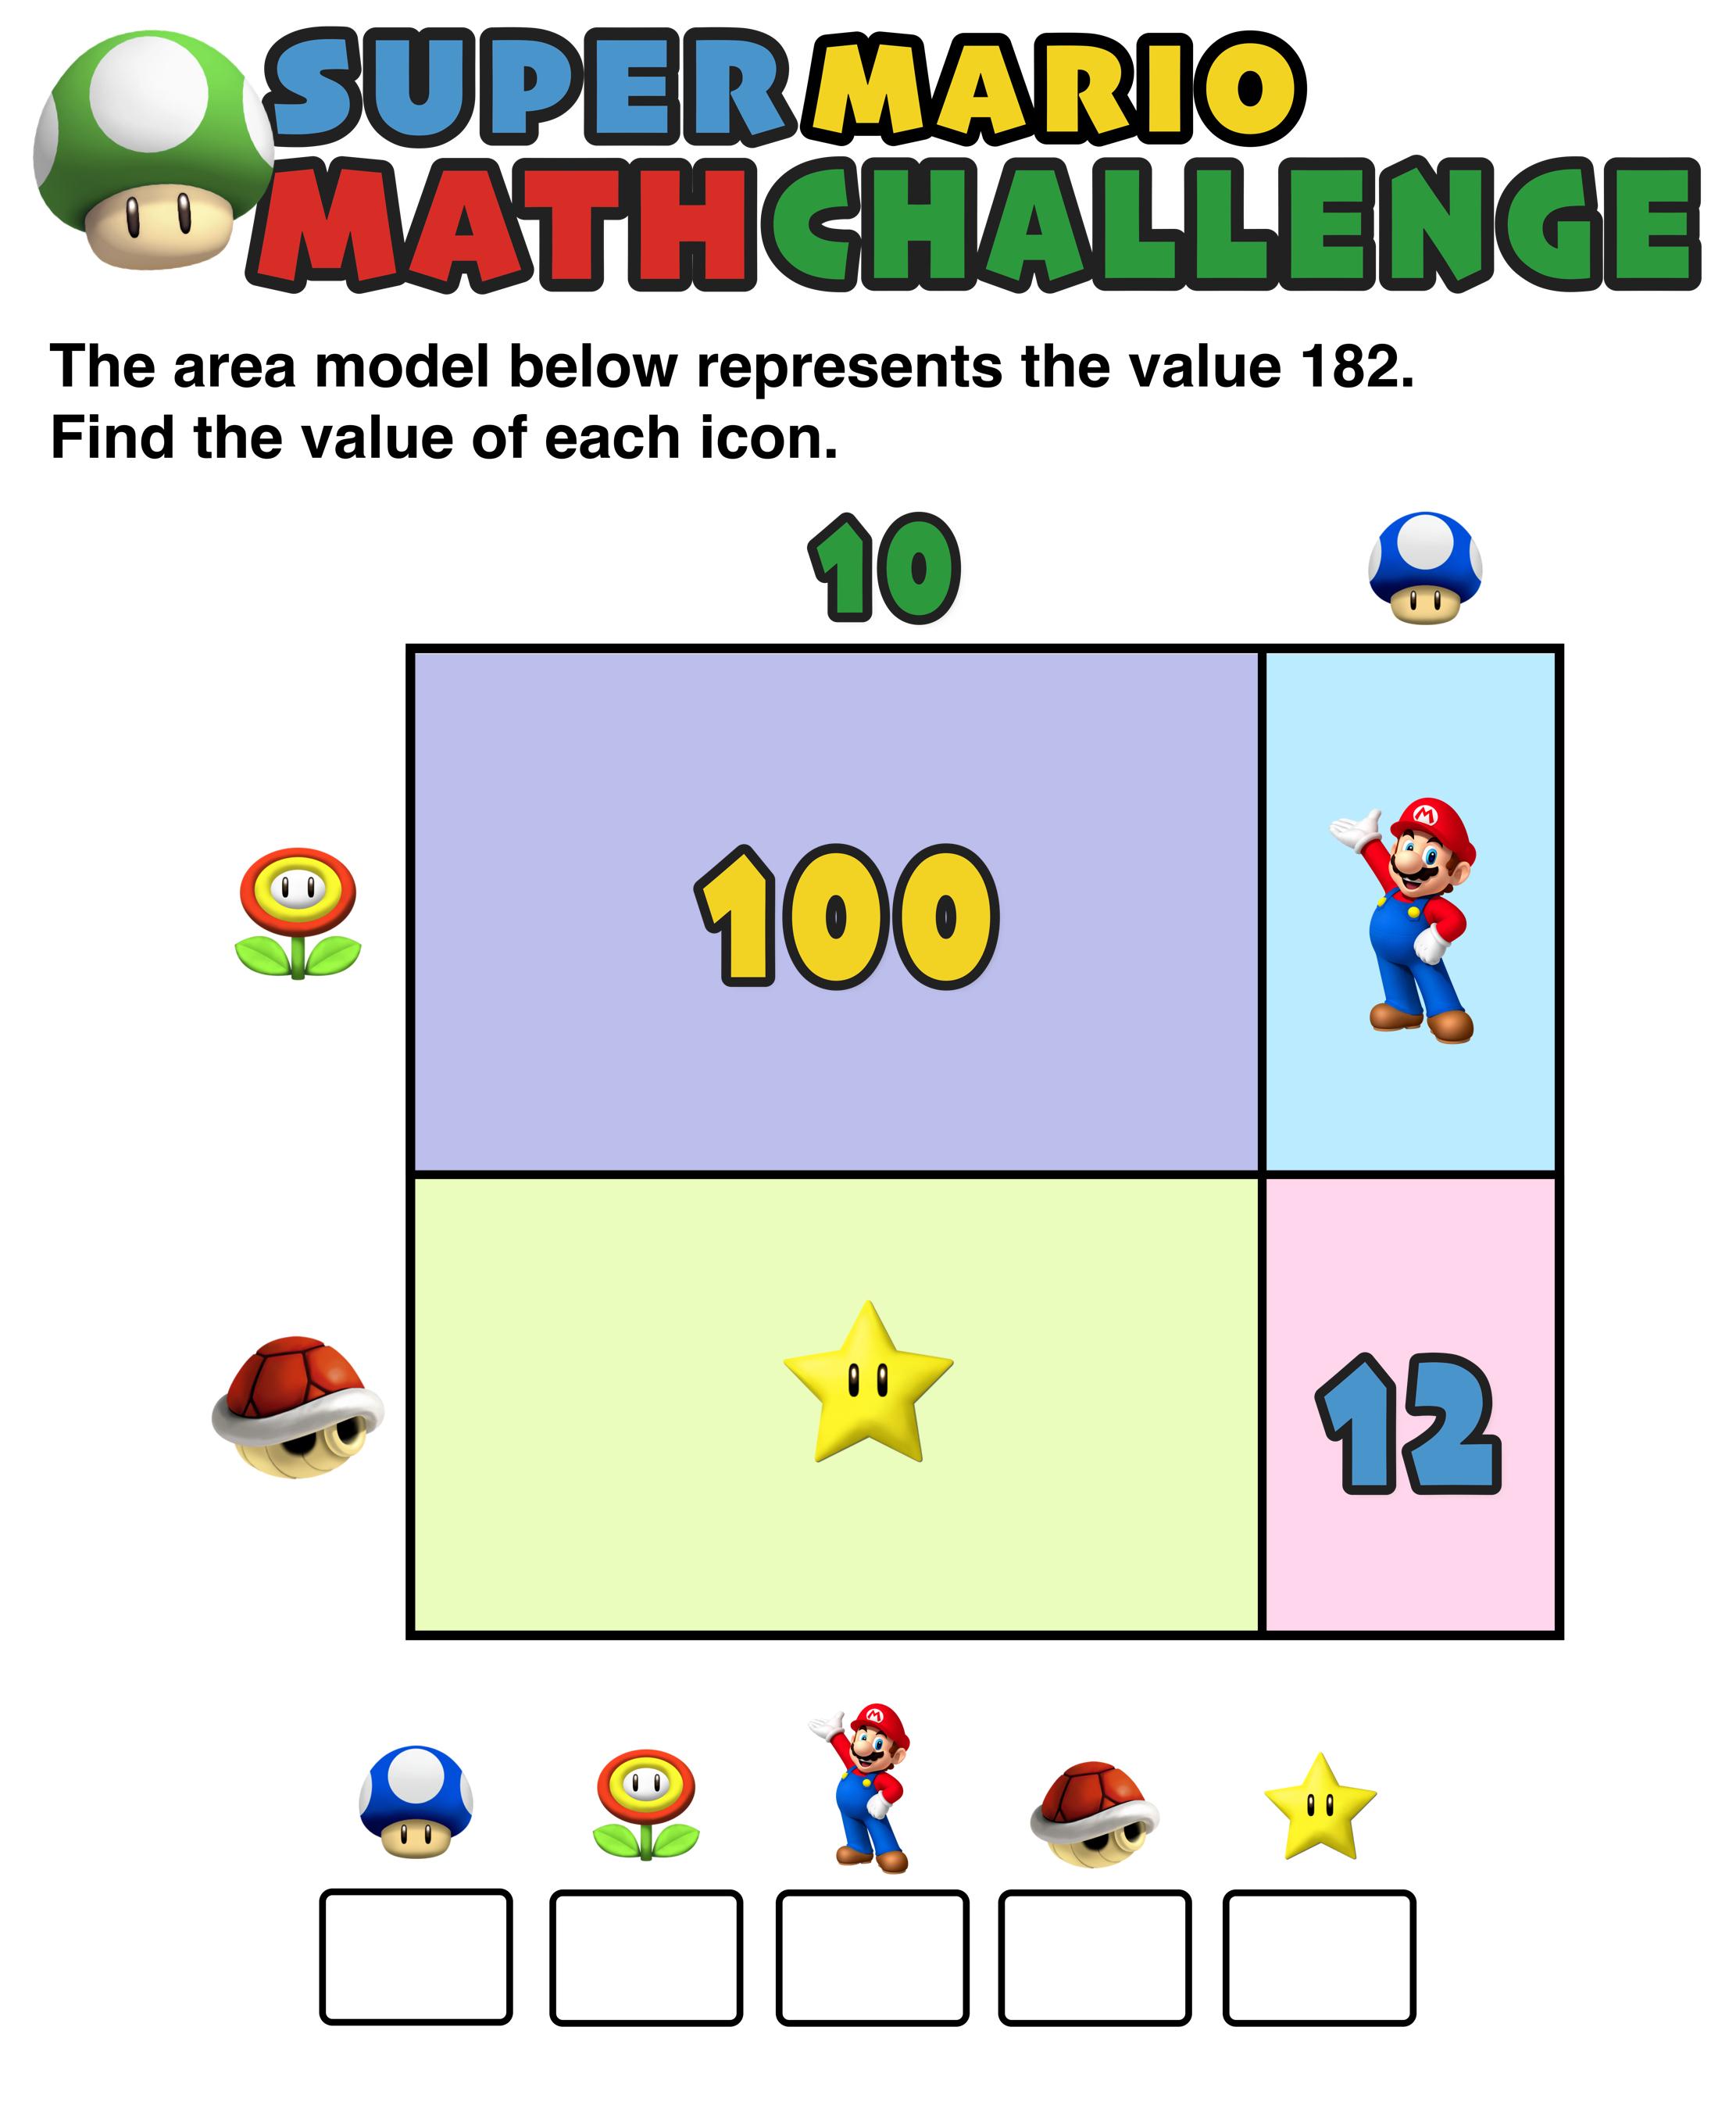 MarioAreaModel.jpg